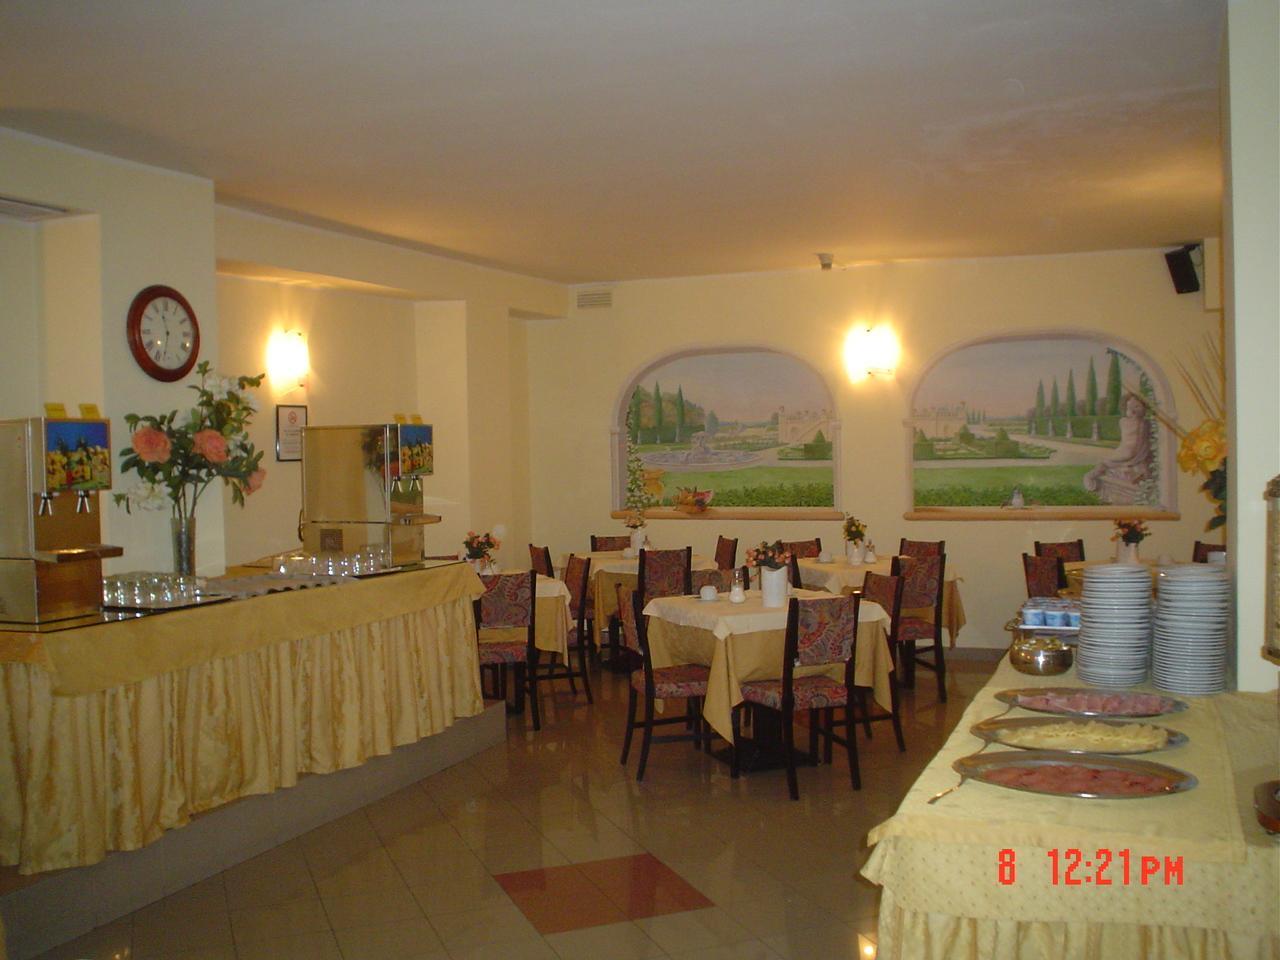 Hotel Soperga - Italy - Milan